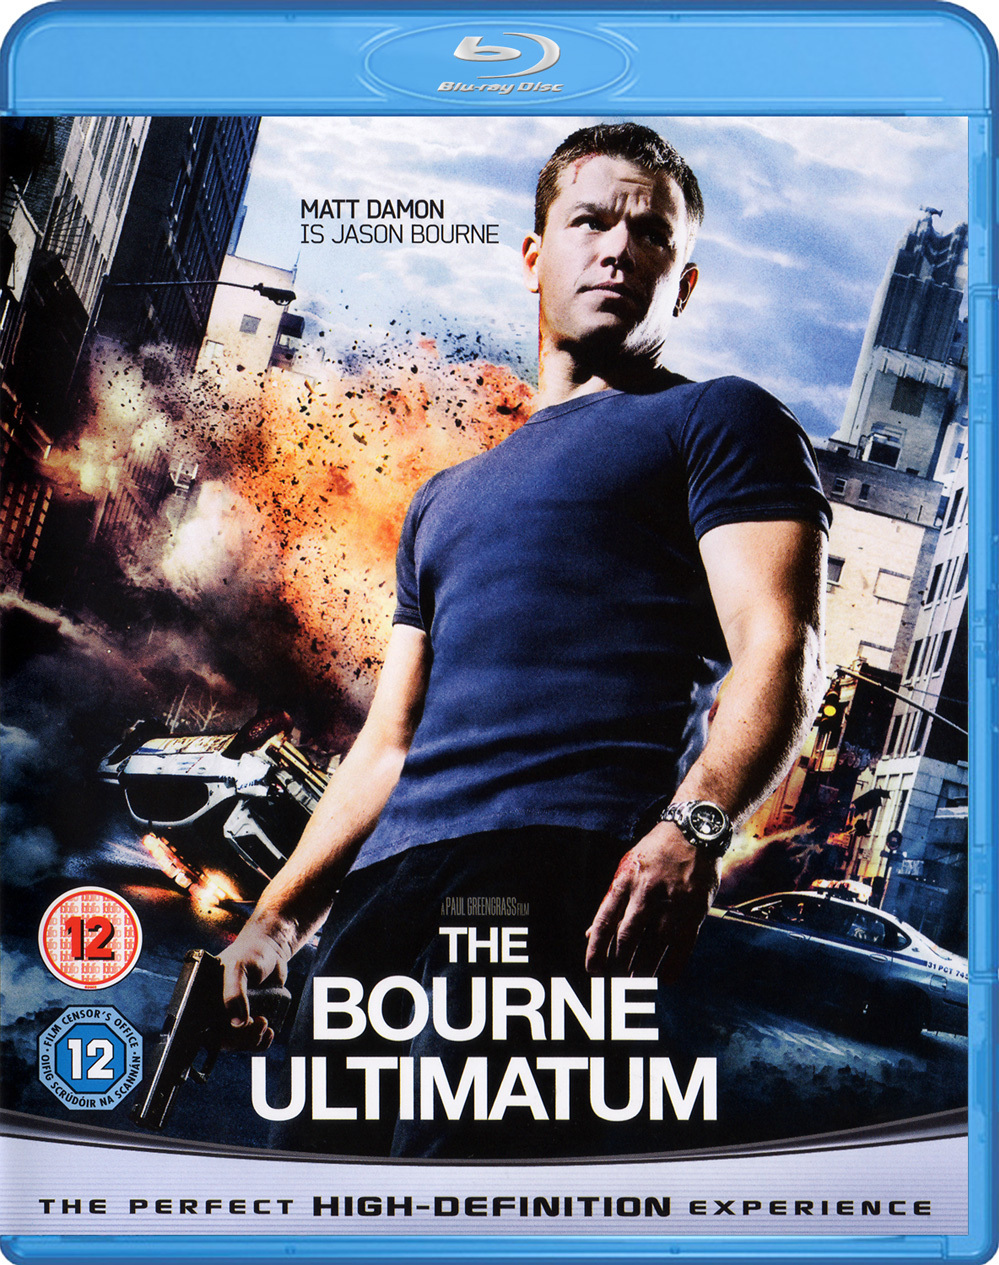 Ultimátum Bourne [BD25]